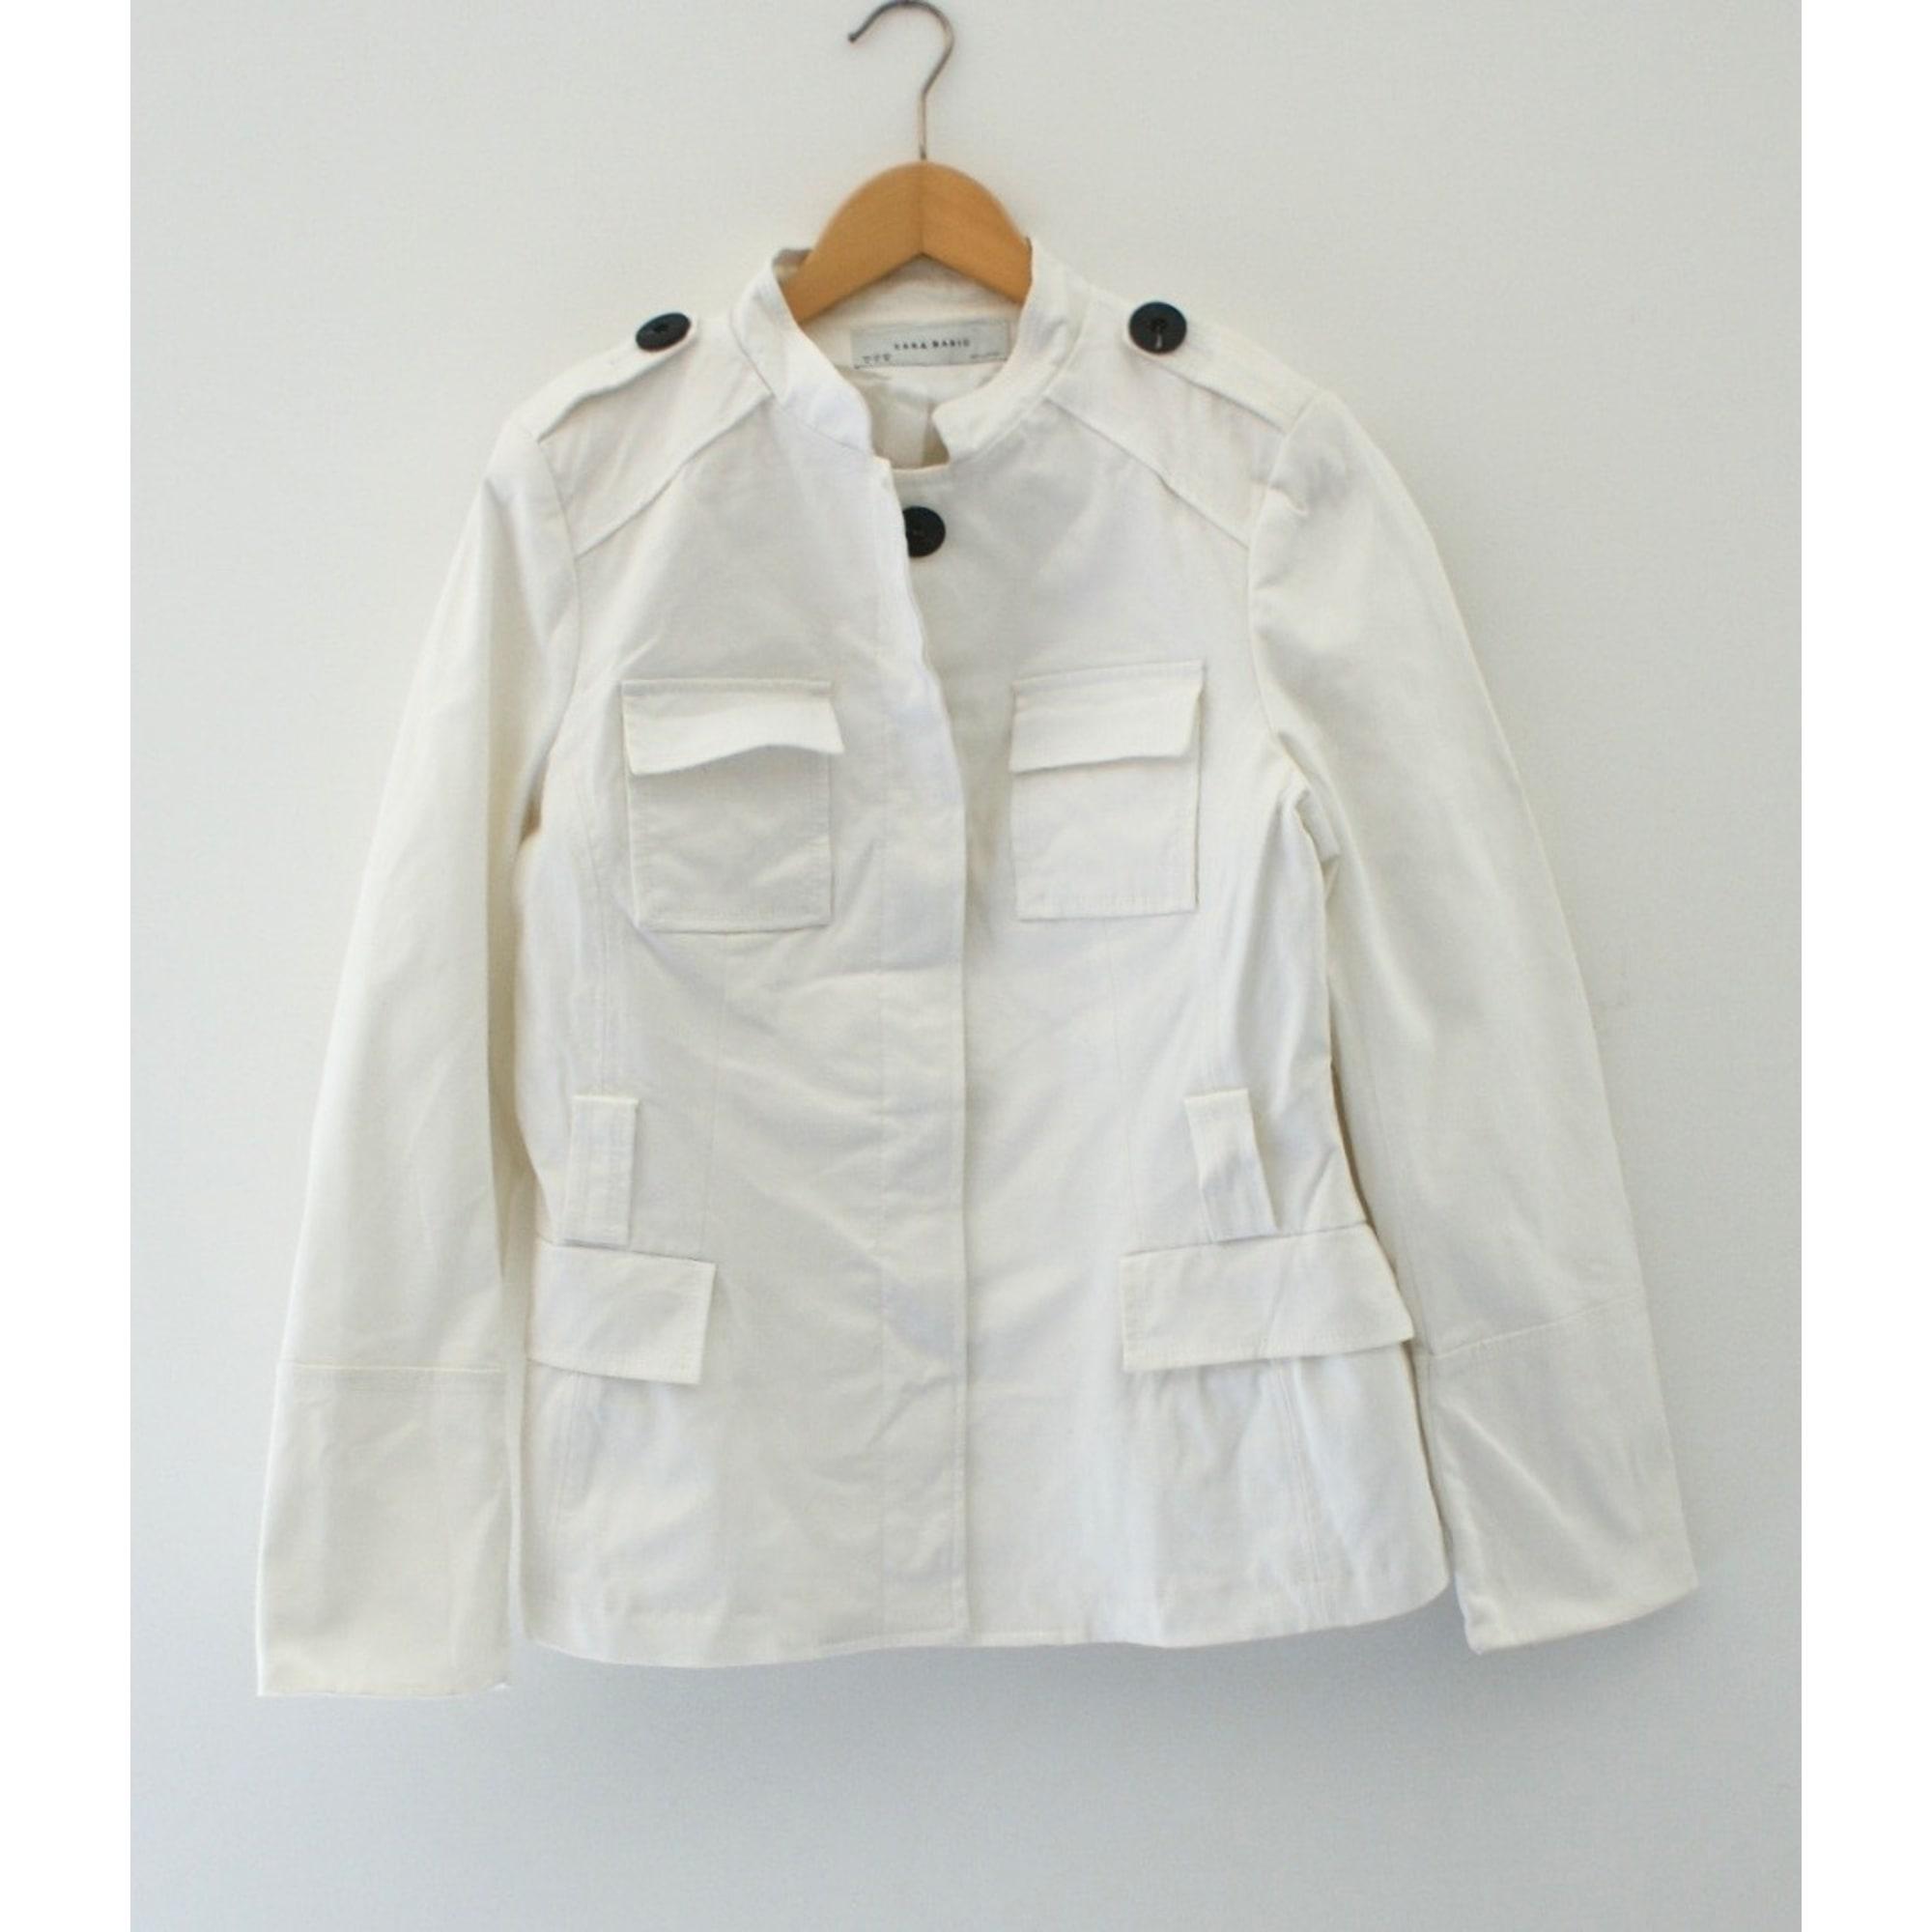 Veste ZARA Blanc, blanc cassé, écru